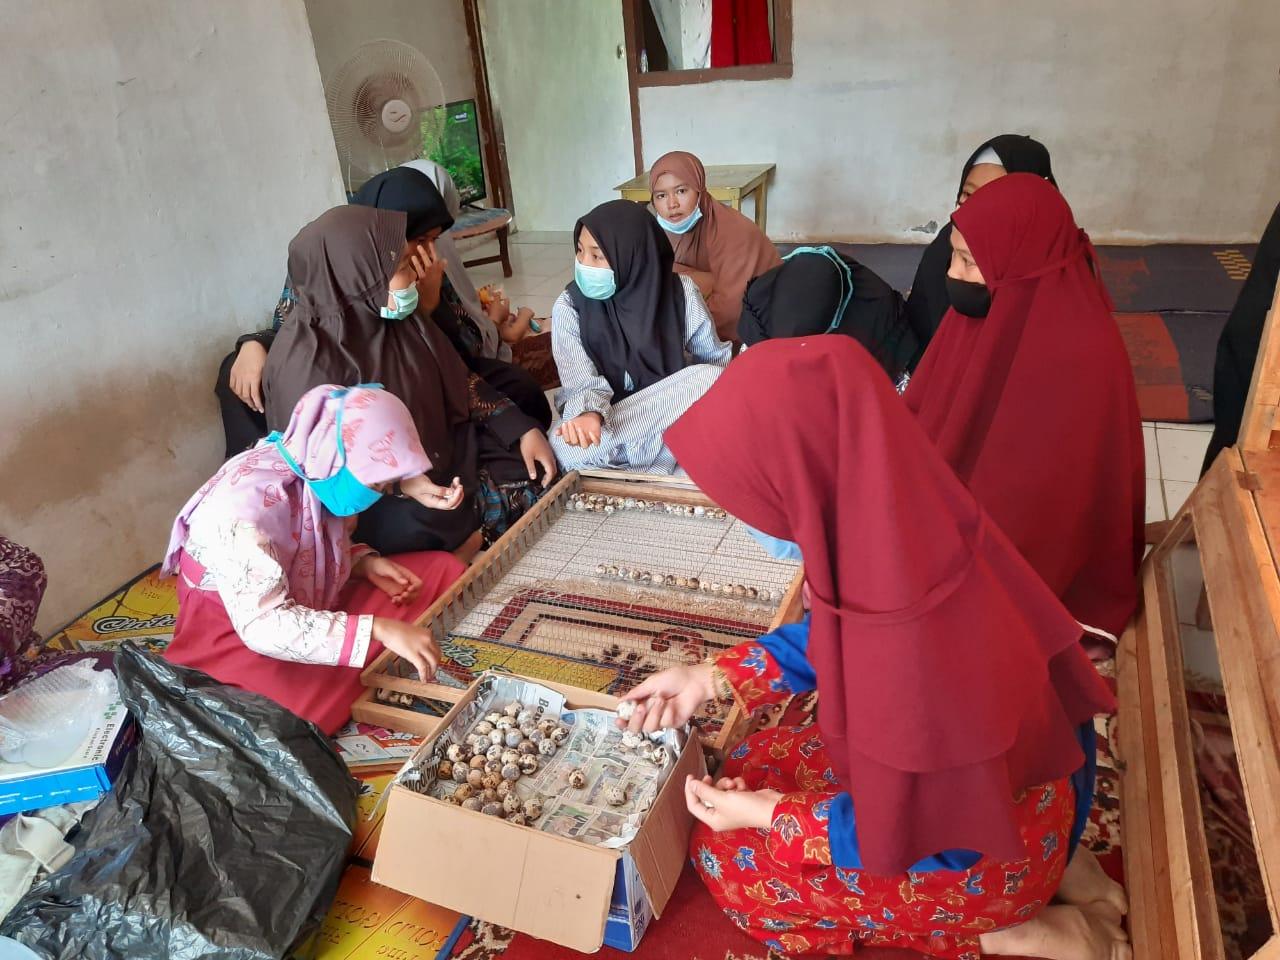 Pelatihan Penetasasan Telur Puyuh yang diikuti 13 orang anak Panti Asuhan 'Aisyiyah Kasih Ibu pada Rabu, 19 Agustus 2020 di peternakan Dian Hidayatullah, S.Pt., M.Ling., Pematang, Gubernur Kota Bengkulu.